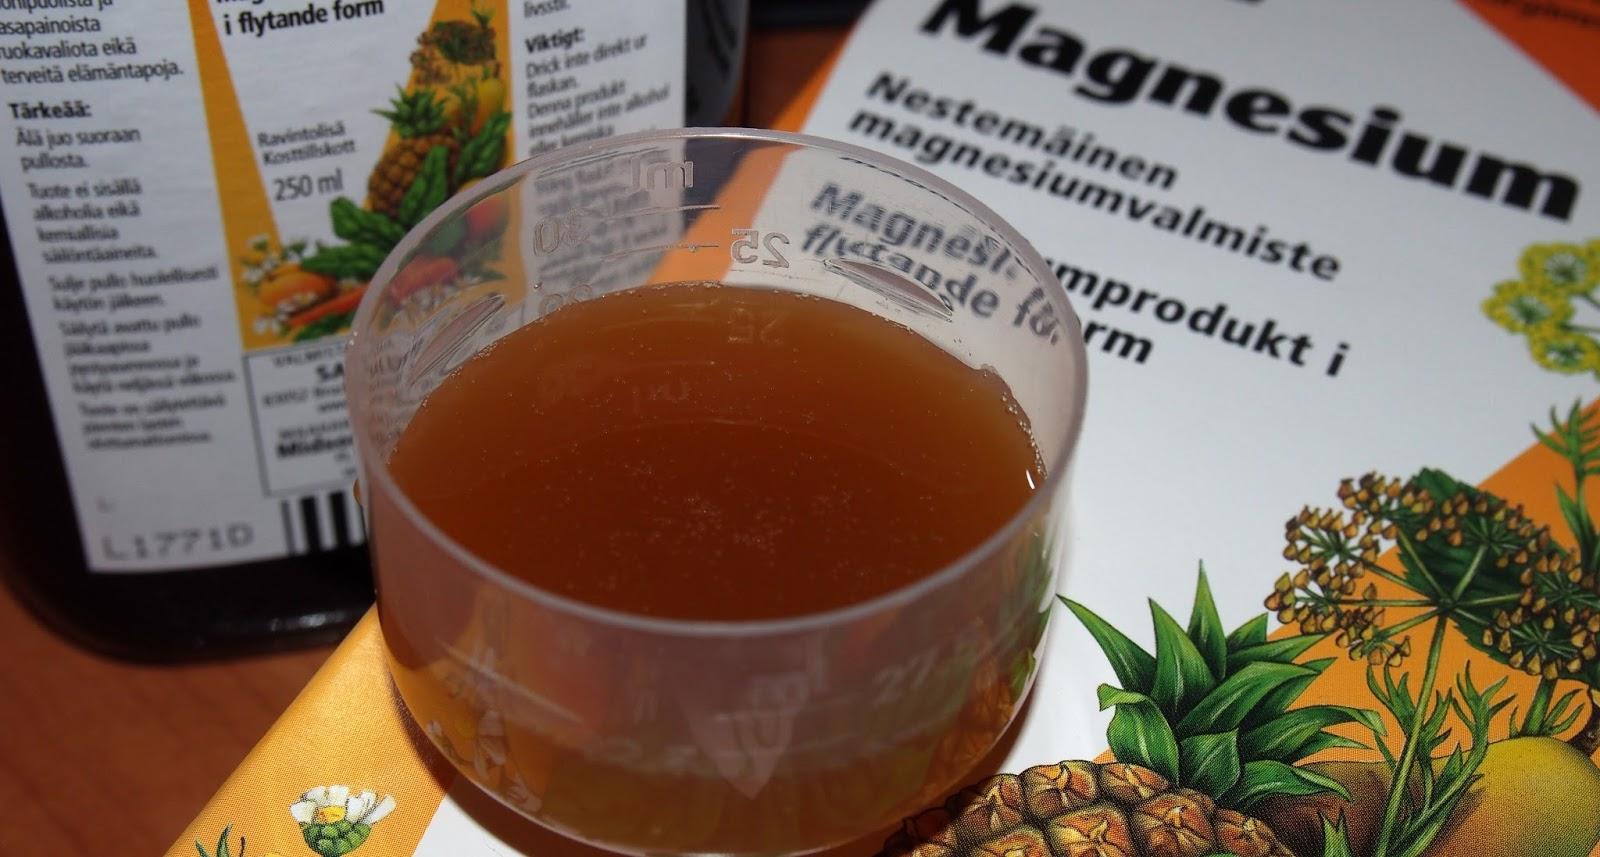 salus magnesium flytande